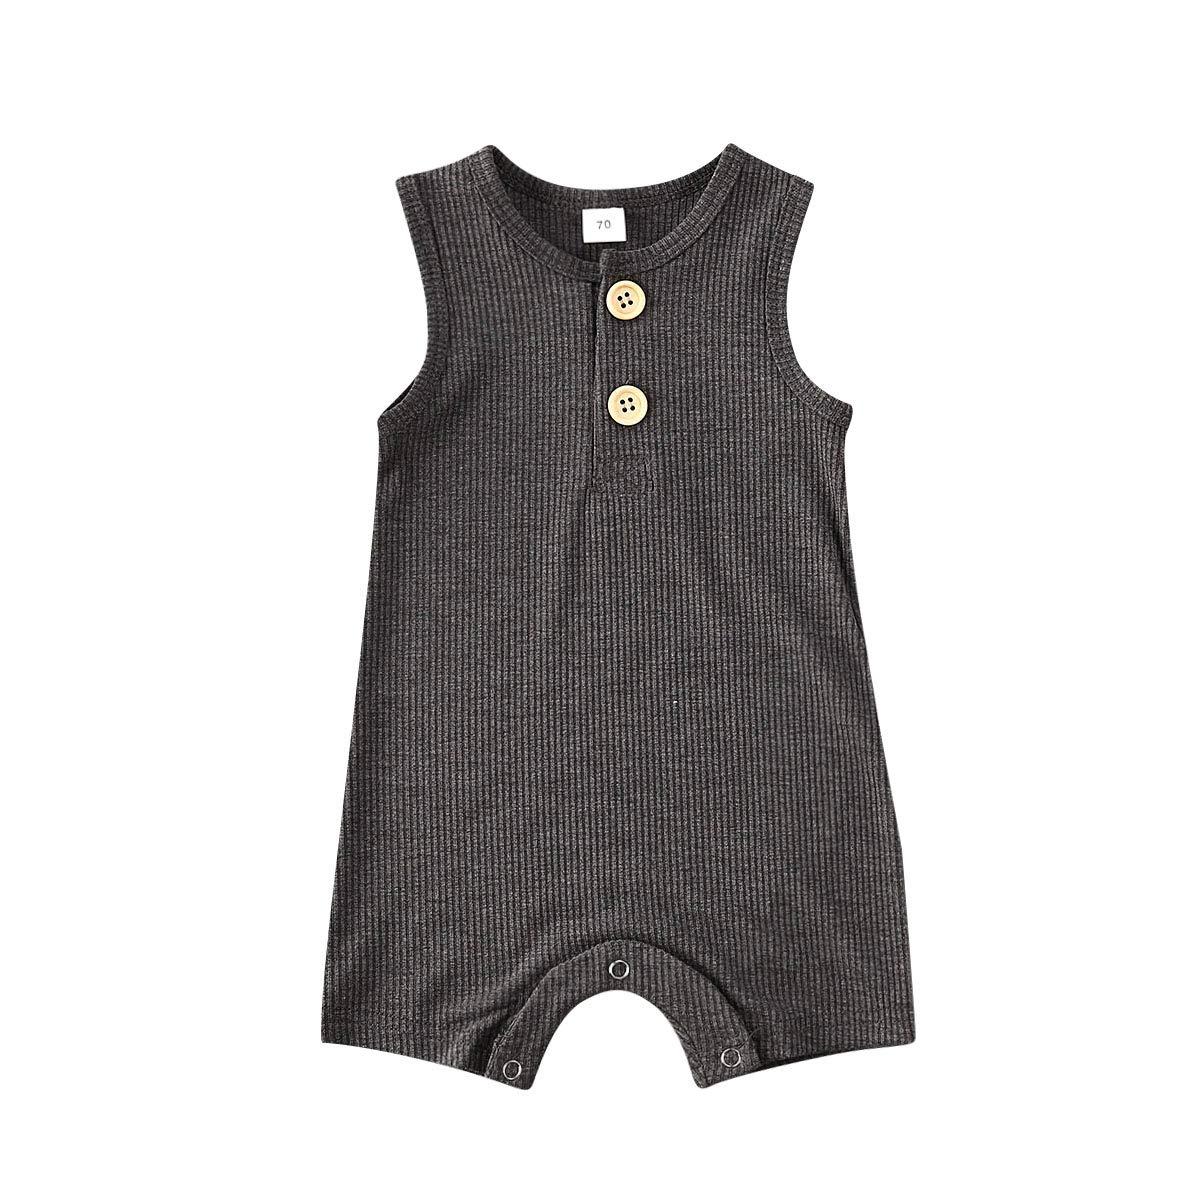 Bodysuit Pants Hat Autumn Winter Pajamas Set 3Pcs Casual Outfit Set Zerototens Baby Clothing Set,0-24 Months Newborn Baby Girl Boy Letter Rainbow Romper Tops